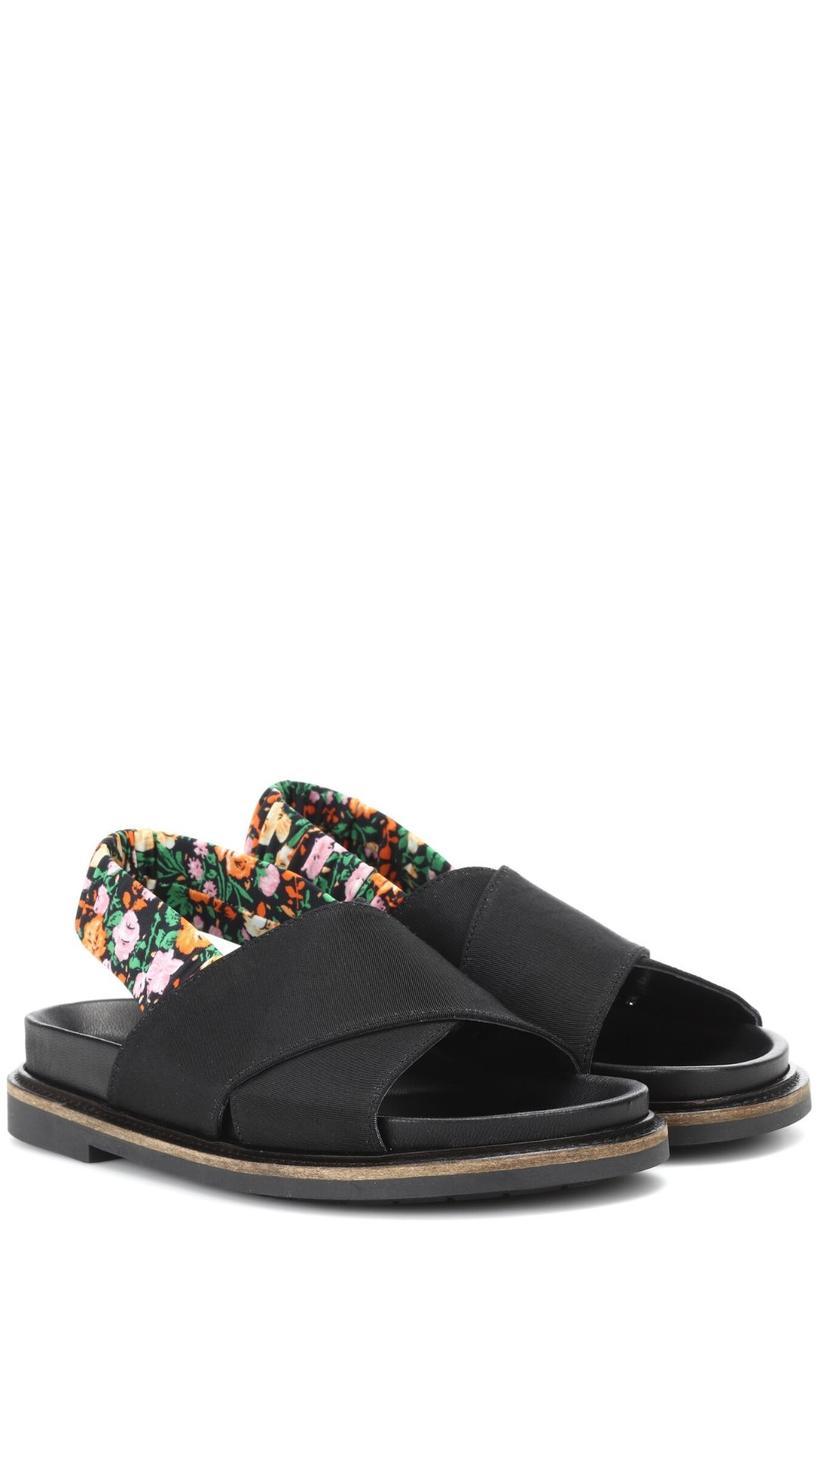 Sandals fashion, Comfy sandals, Sandals, Summer sandals